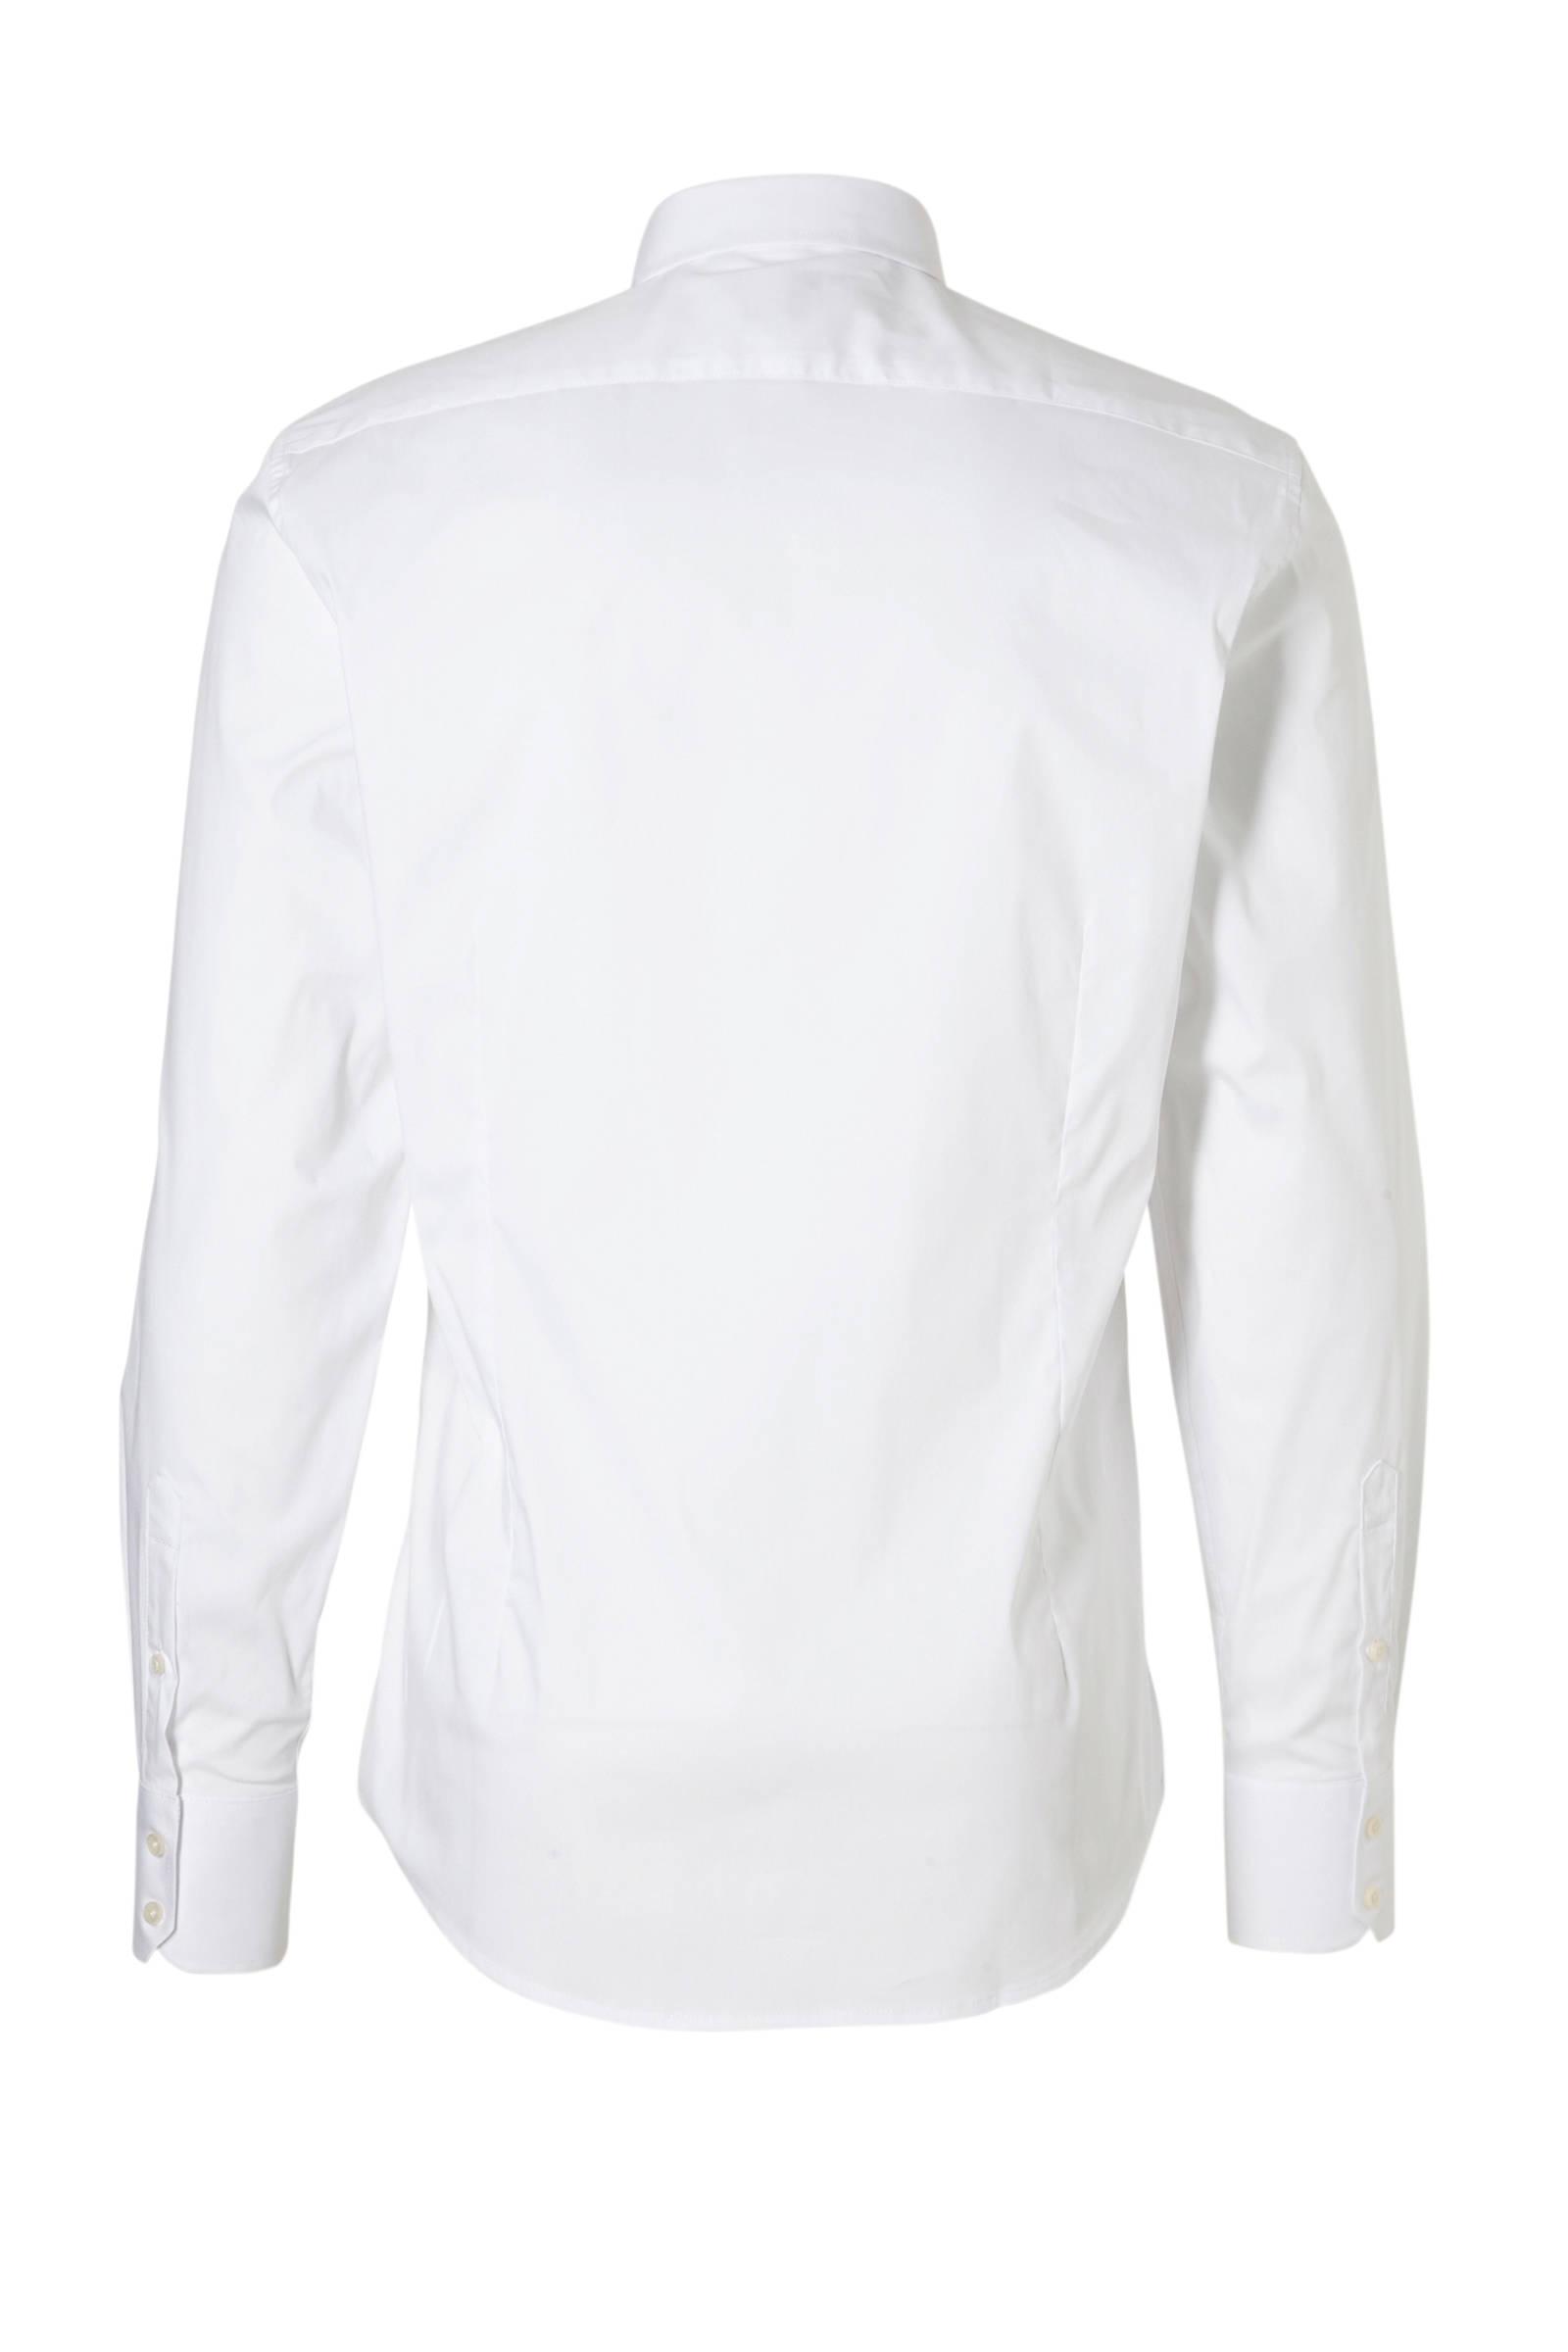 overhemd Morato fit Antony overhemd slim fit Antony Antony Morato slim Morato 1vnCZg